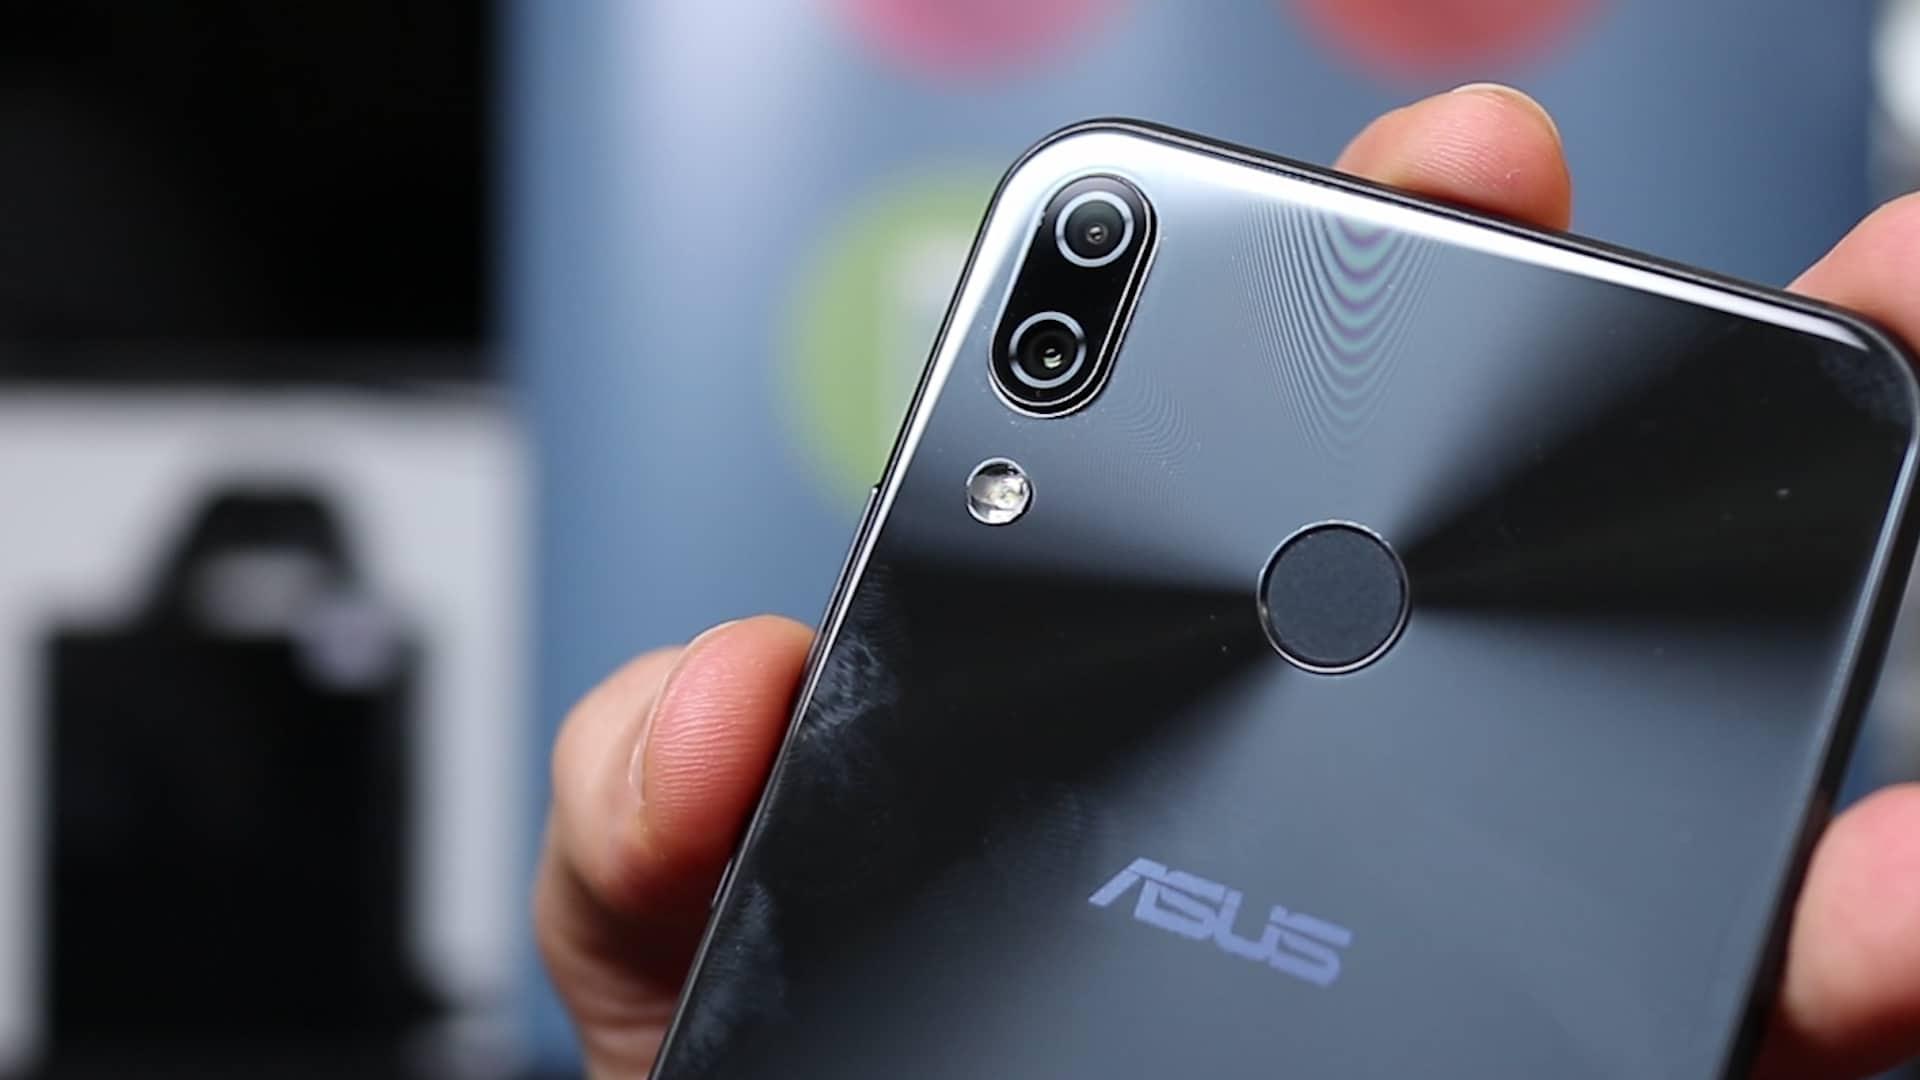 Nowy Smartfon Asusa